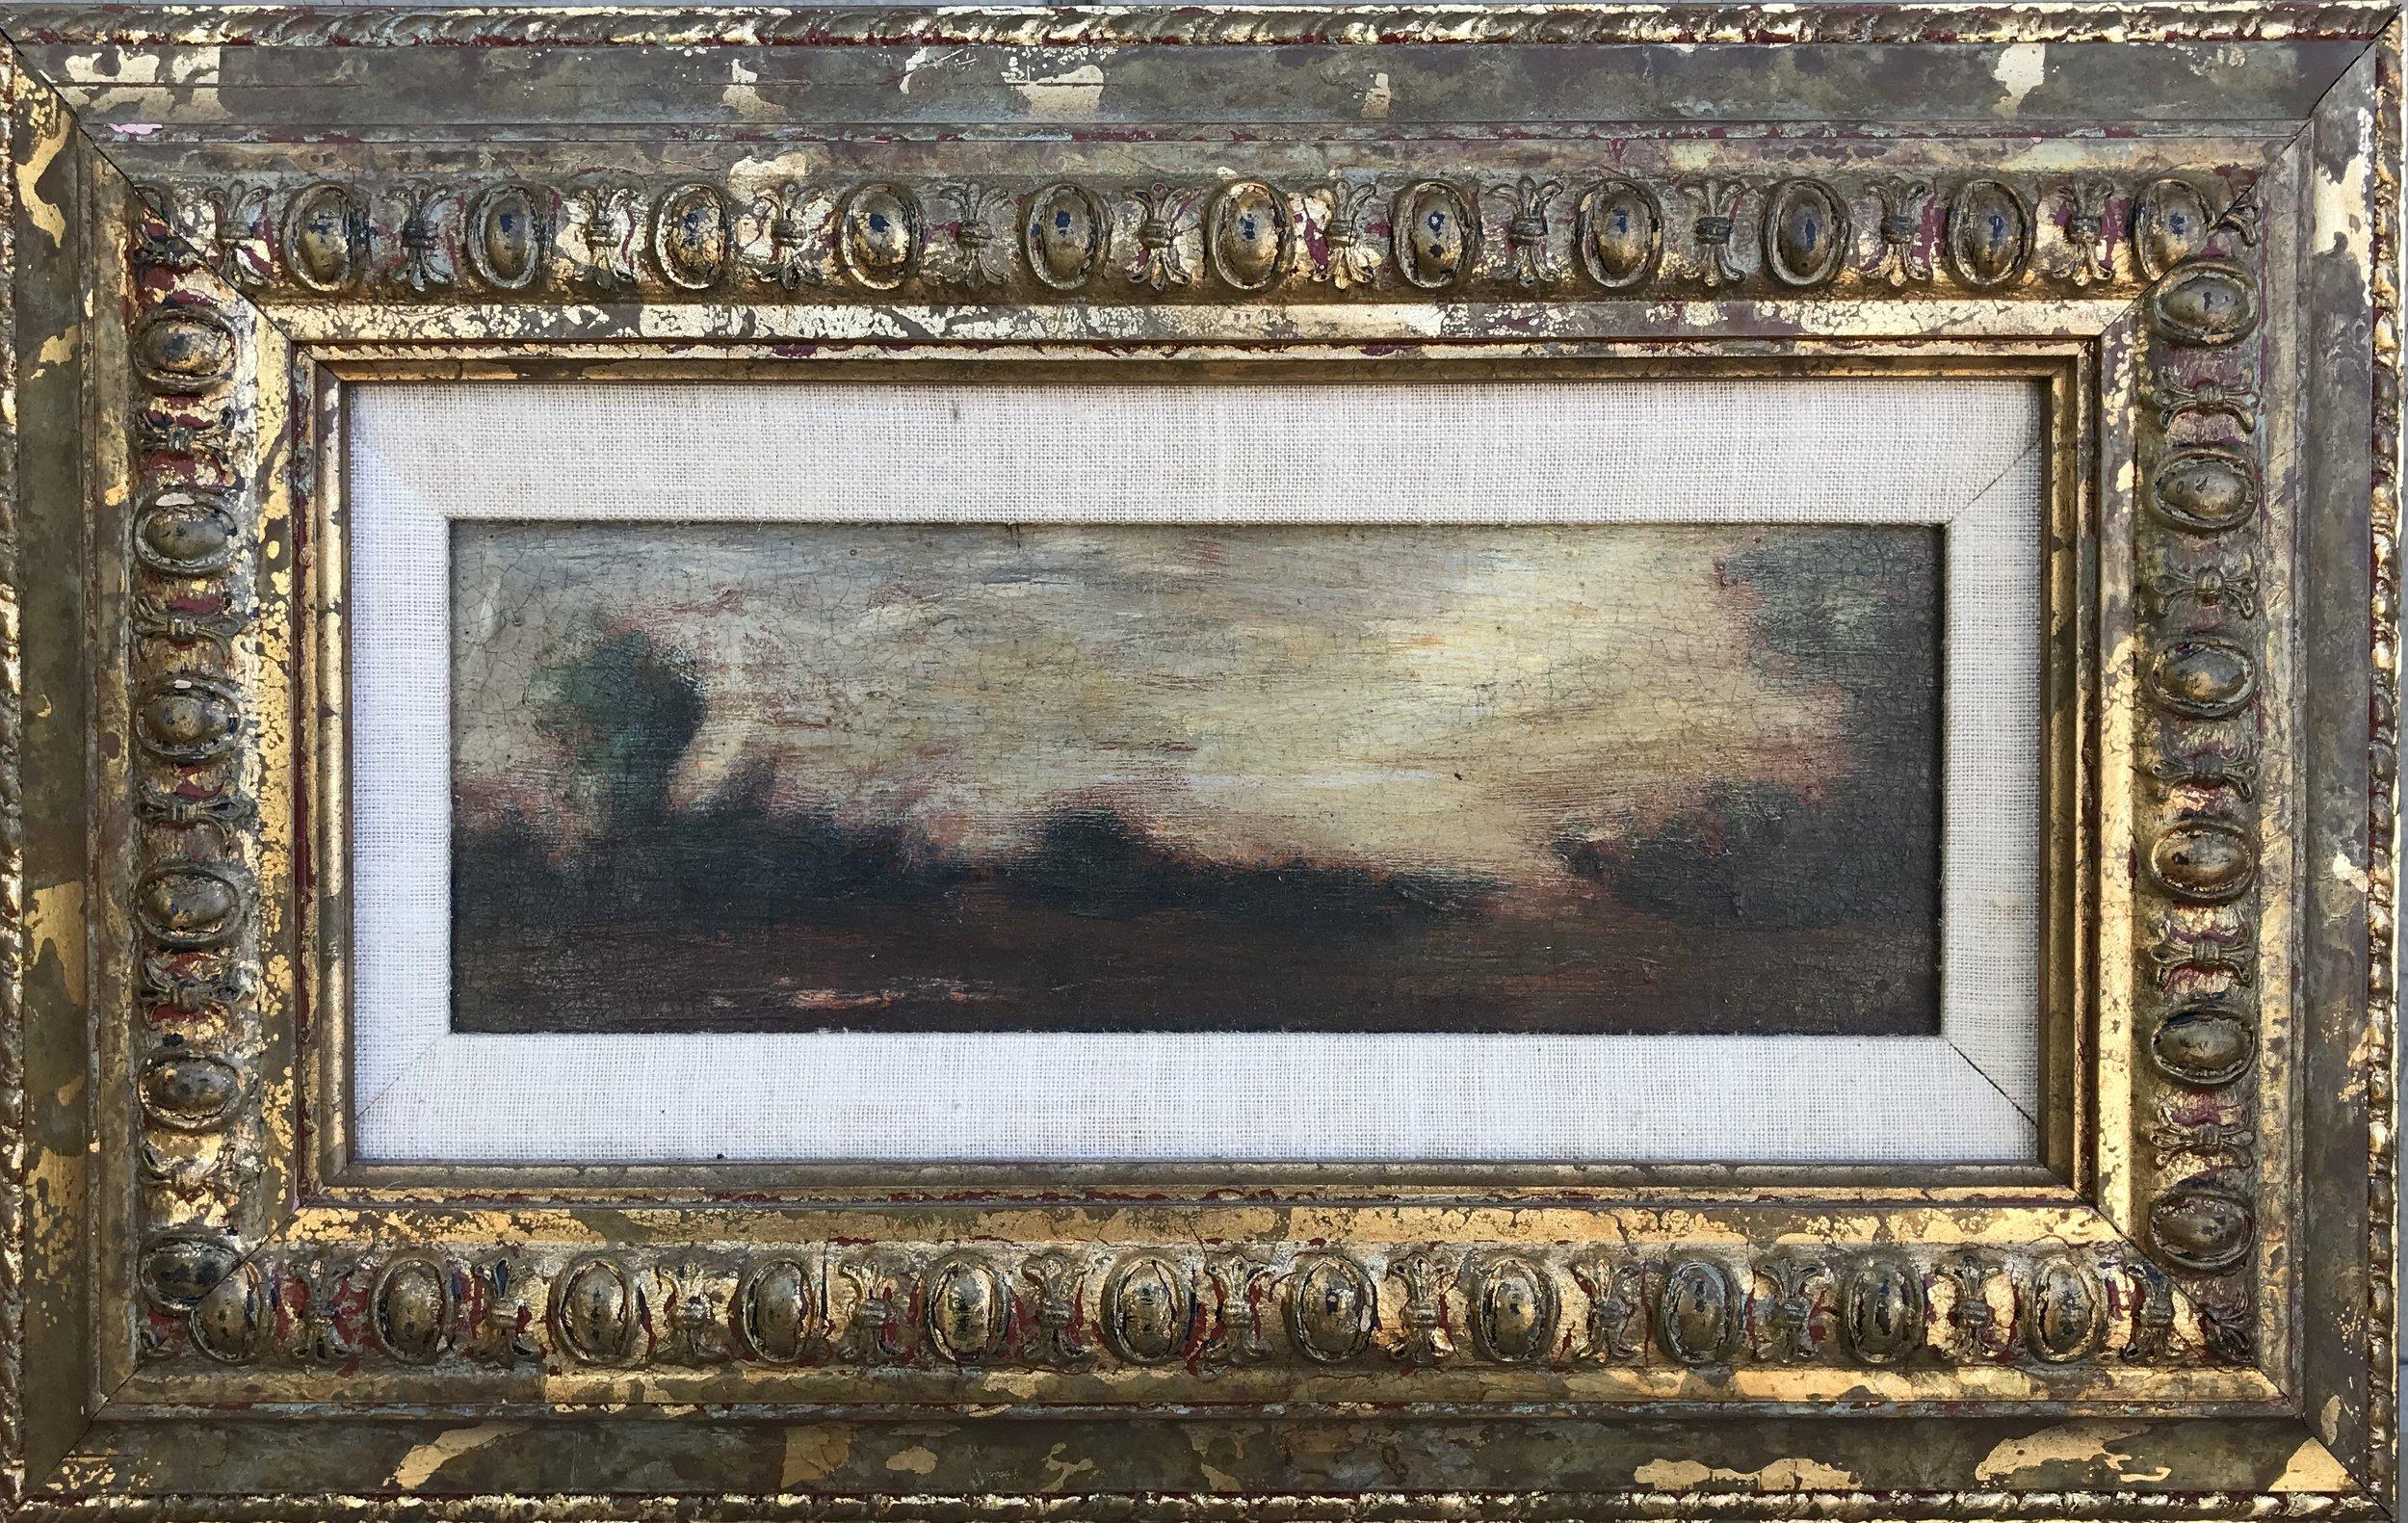 """Sunset Landscape"" - 3 1/2"" x 9 1/2"", oil on canvas. Framed: 10"" x 16""Value: $350Opening Bid: $150email your bid to: art@bradfordbrenner.com"